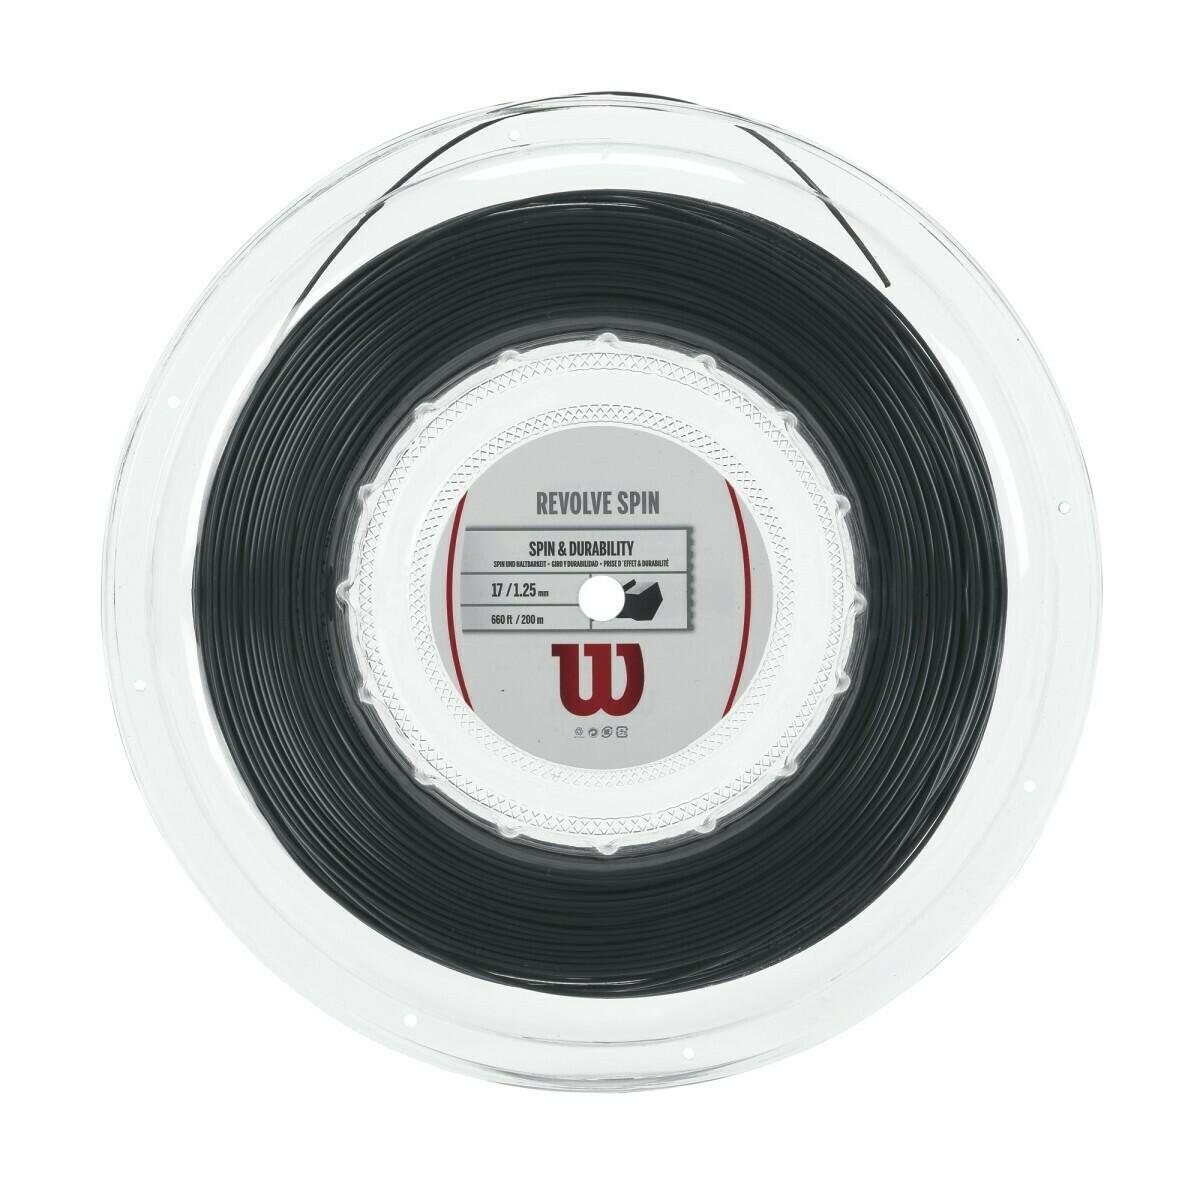 Wilson Revolve Spin 16 Tennis String 200m Reel - Black